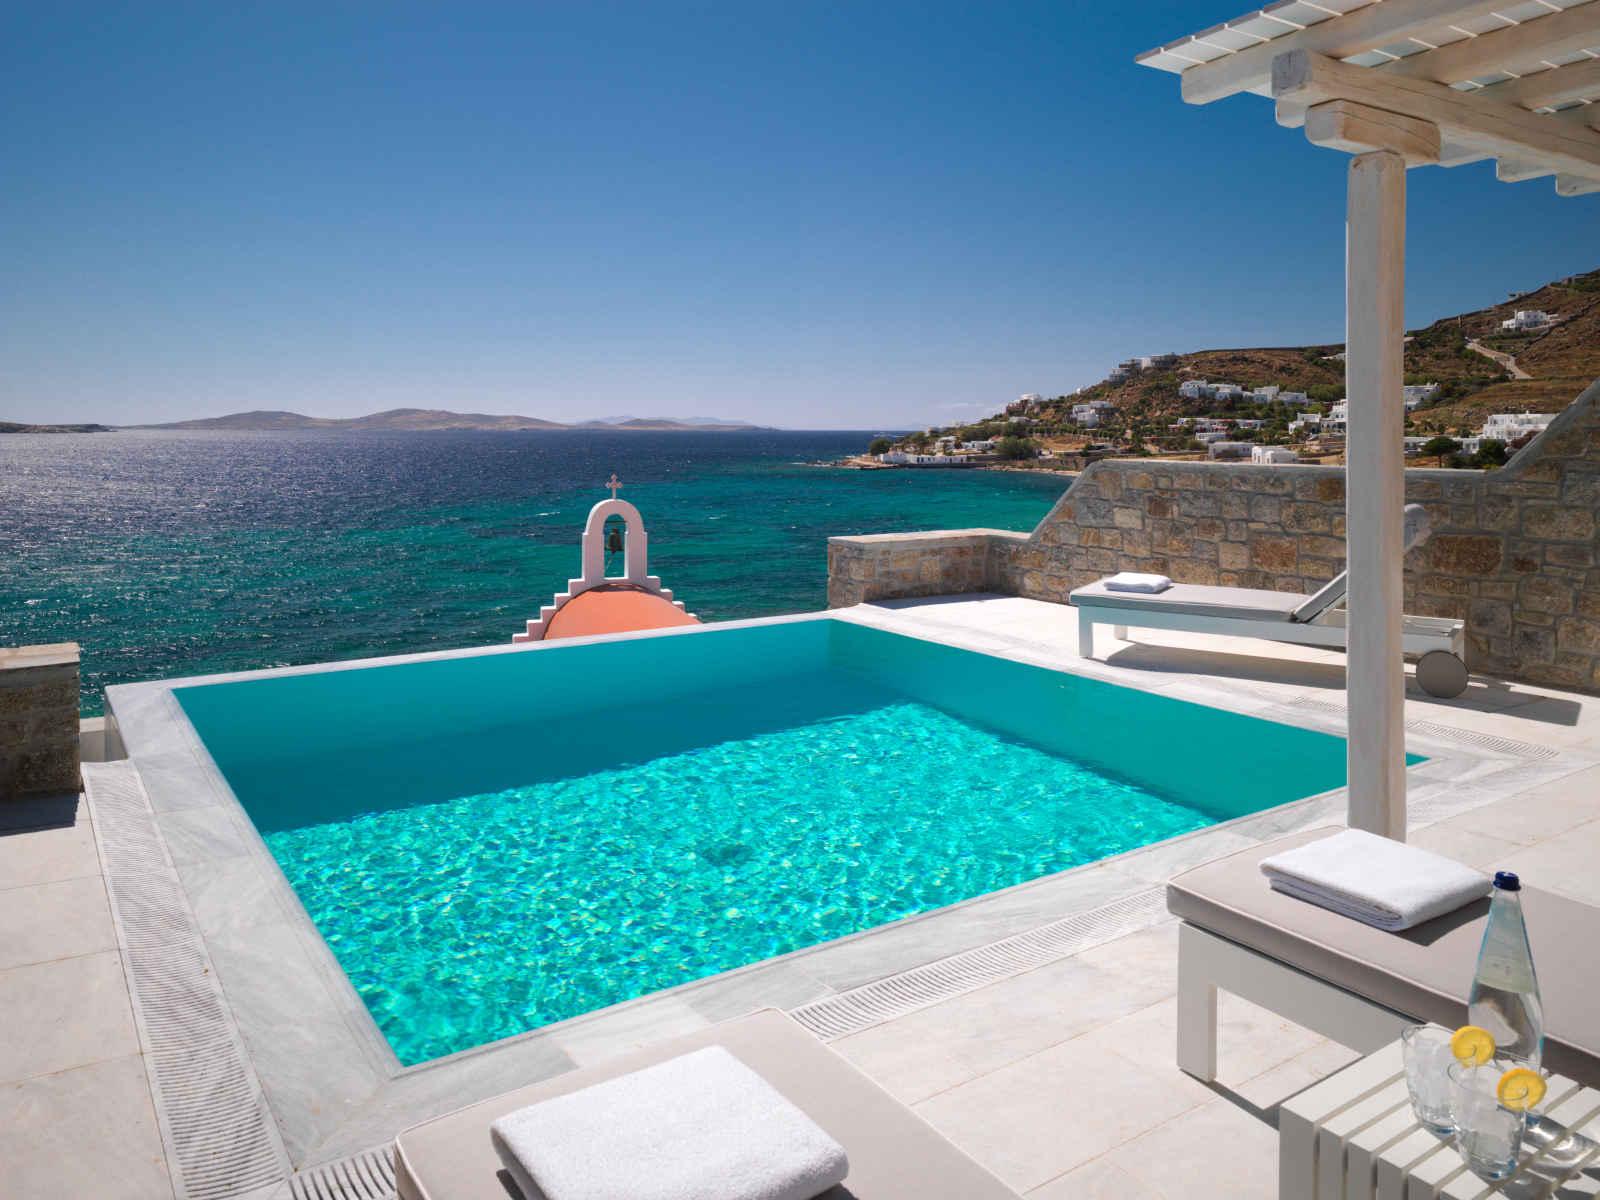 Mykonos Grand Hotel & Resort - 6*